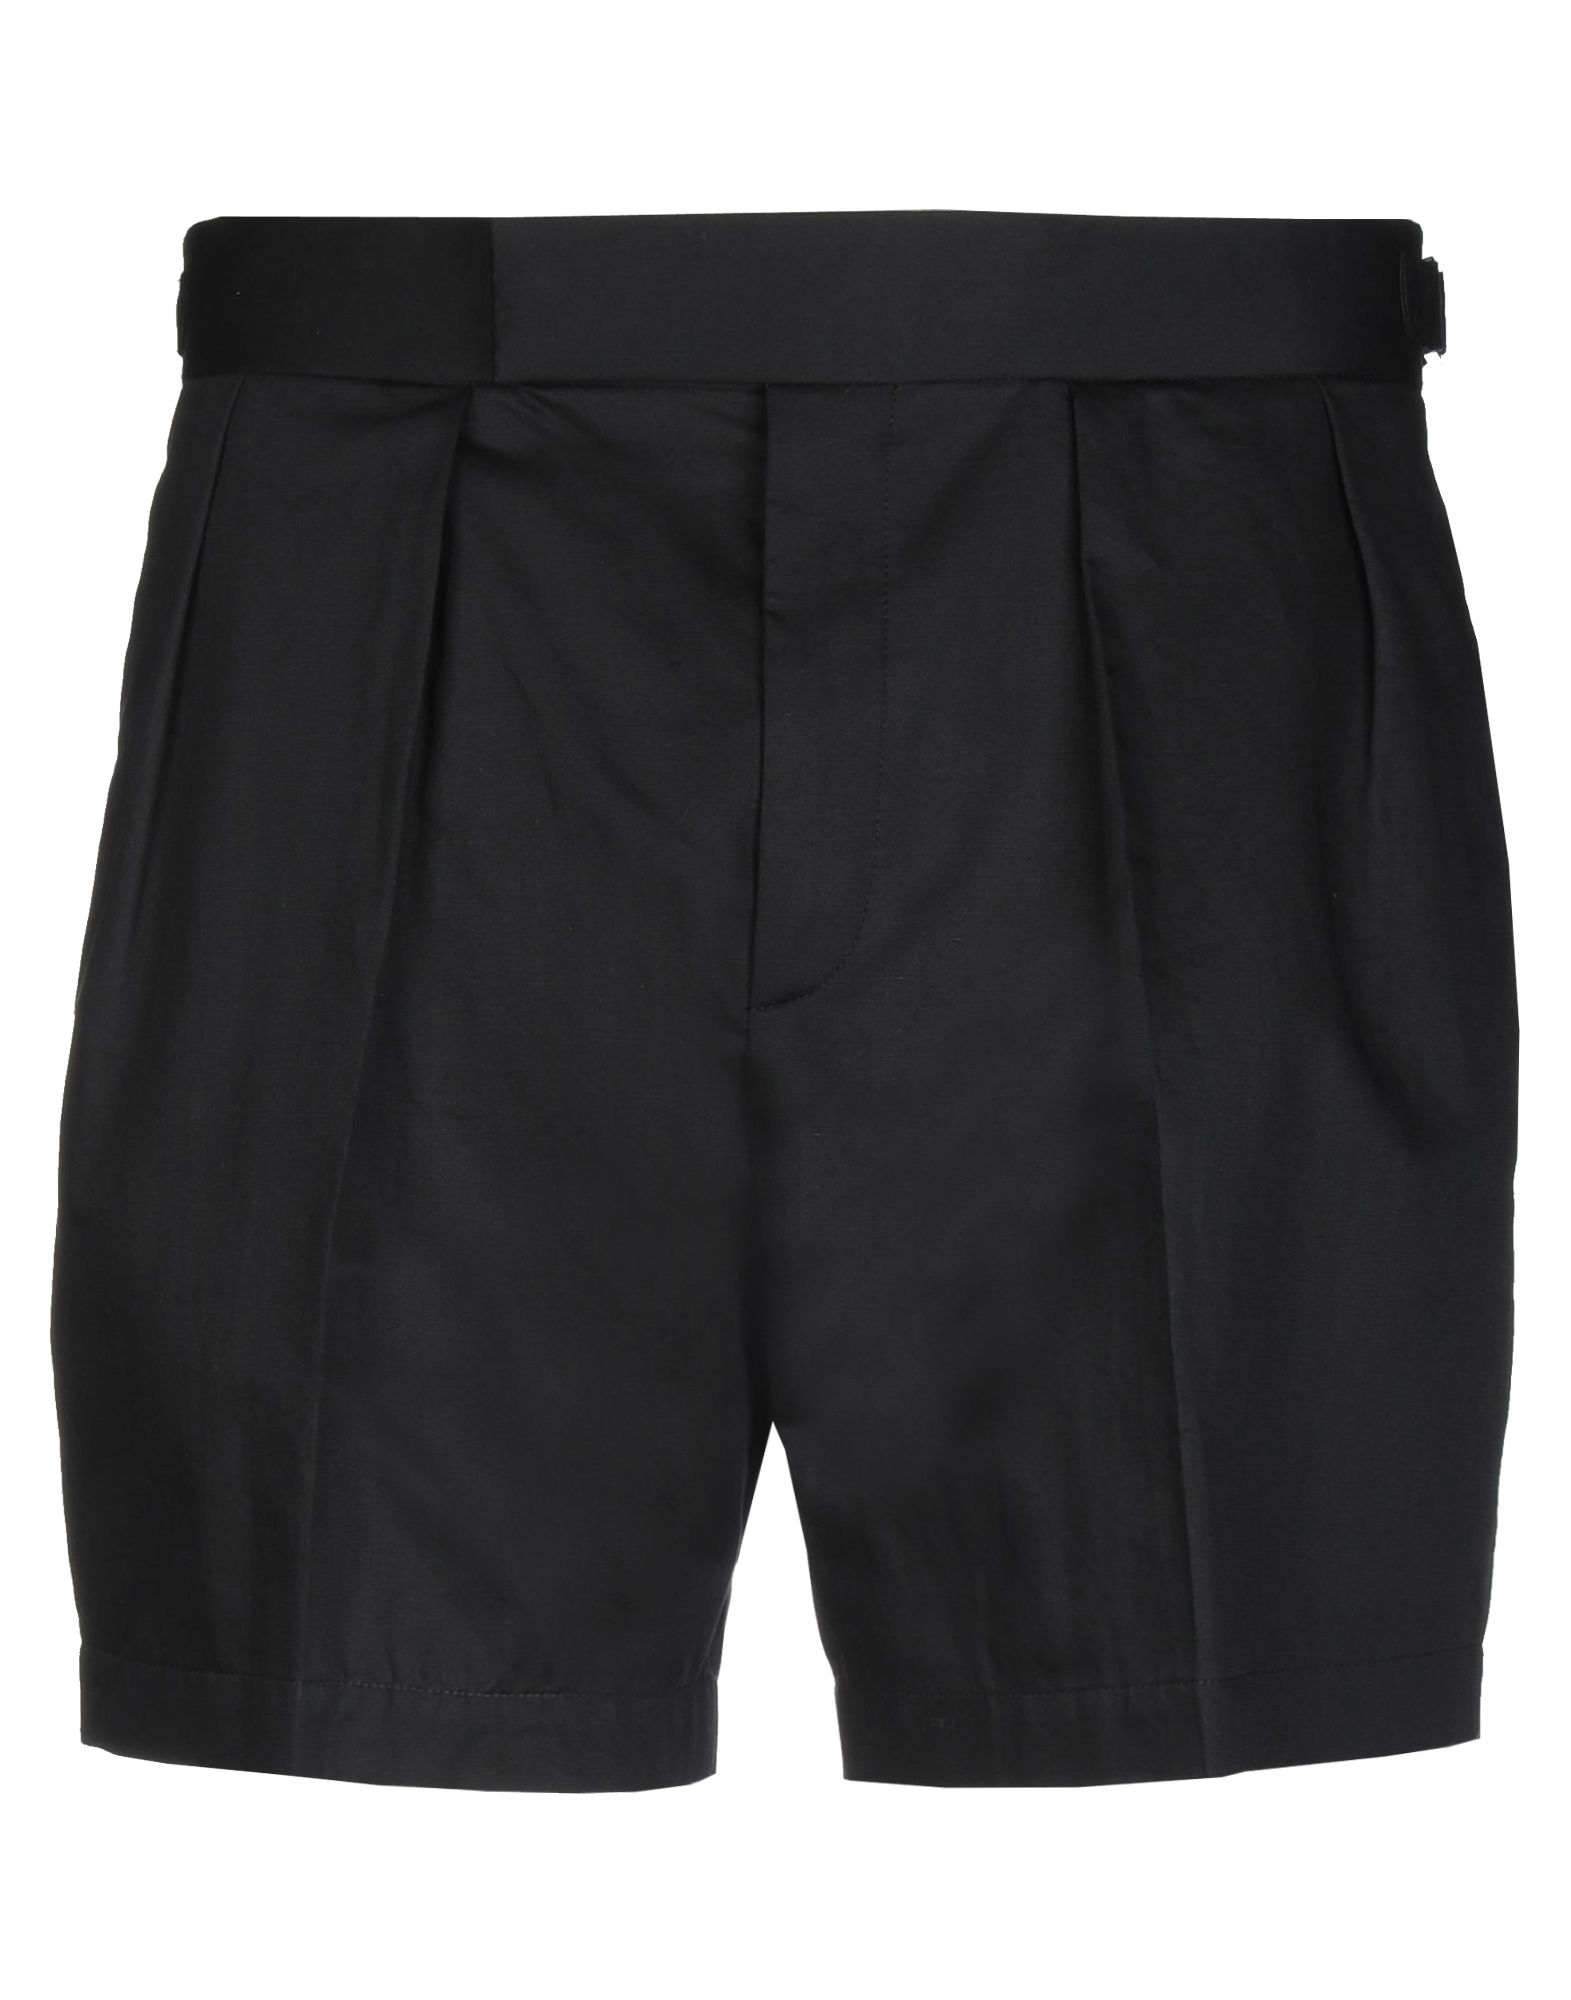 NEIL BARRETT Shorts. twill, folds, strap detailing, basic solid color, high waisted, regular fit, button, zip, multipockets. 71% Cotton, 29% Linen